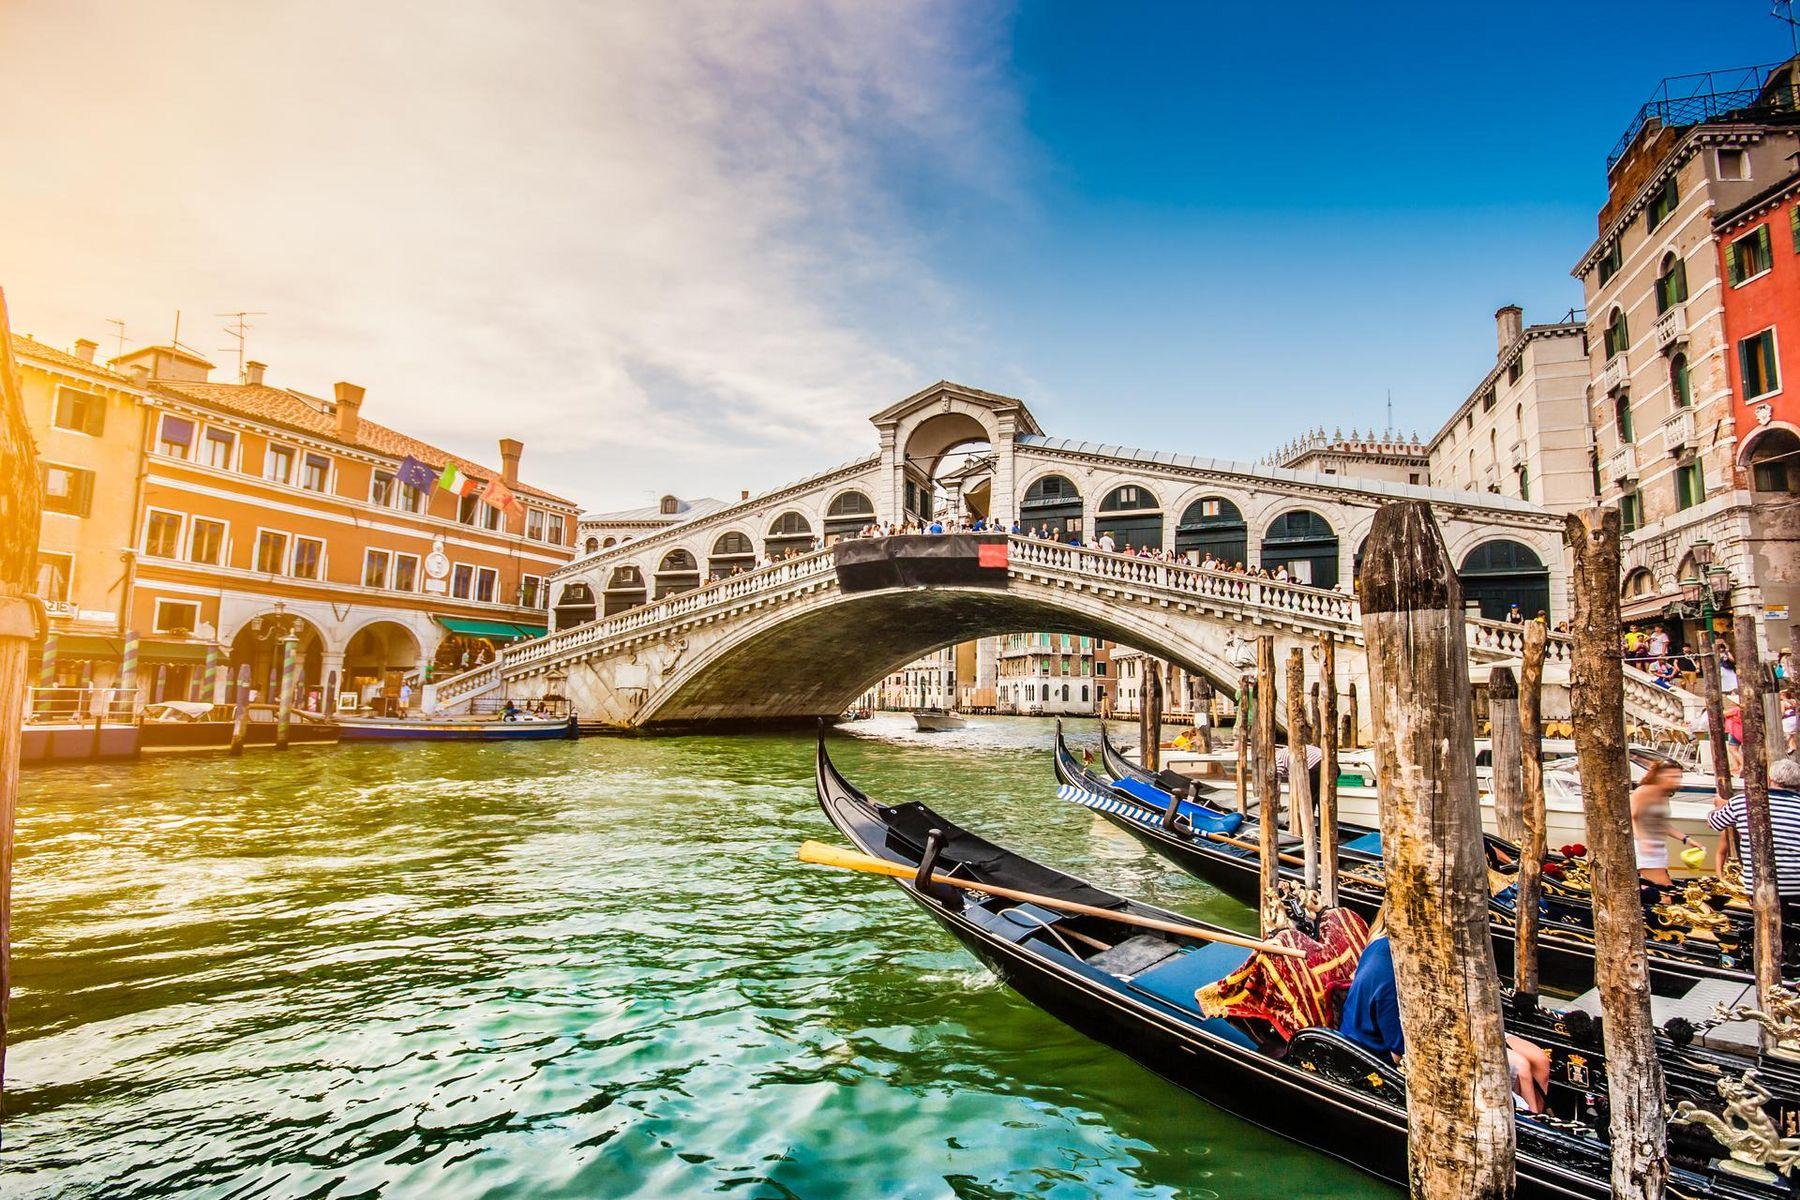 Venedig iStock471133212